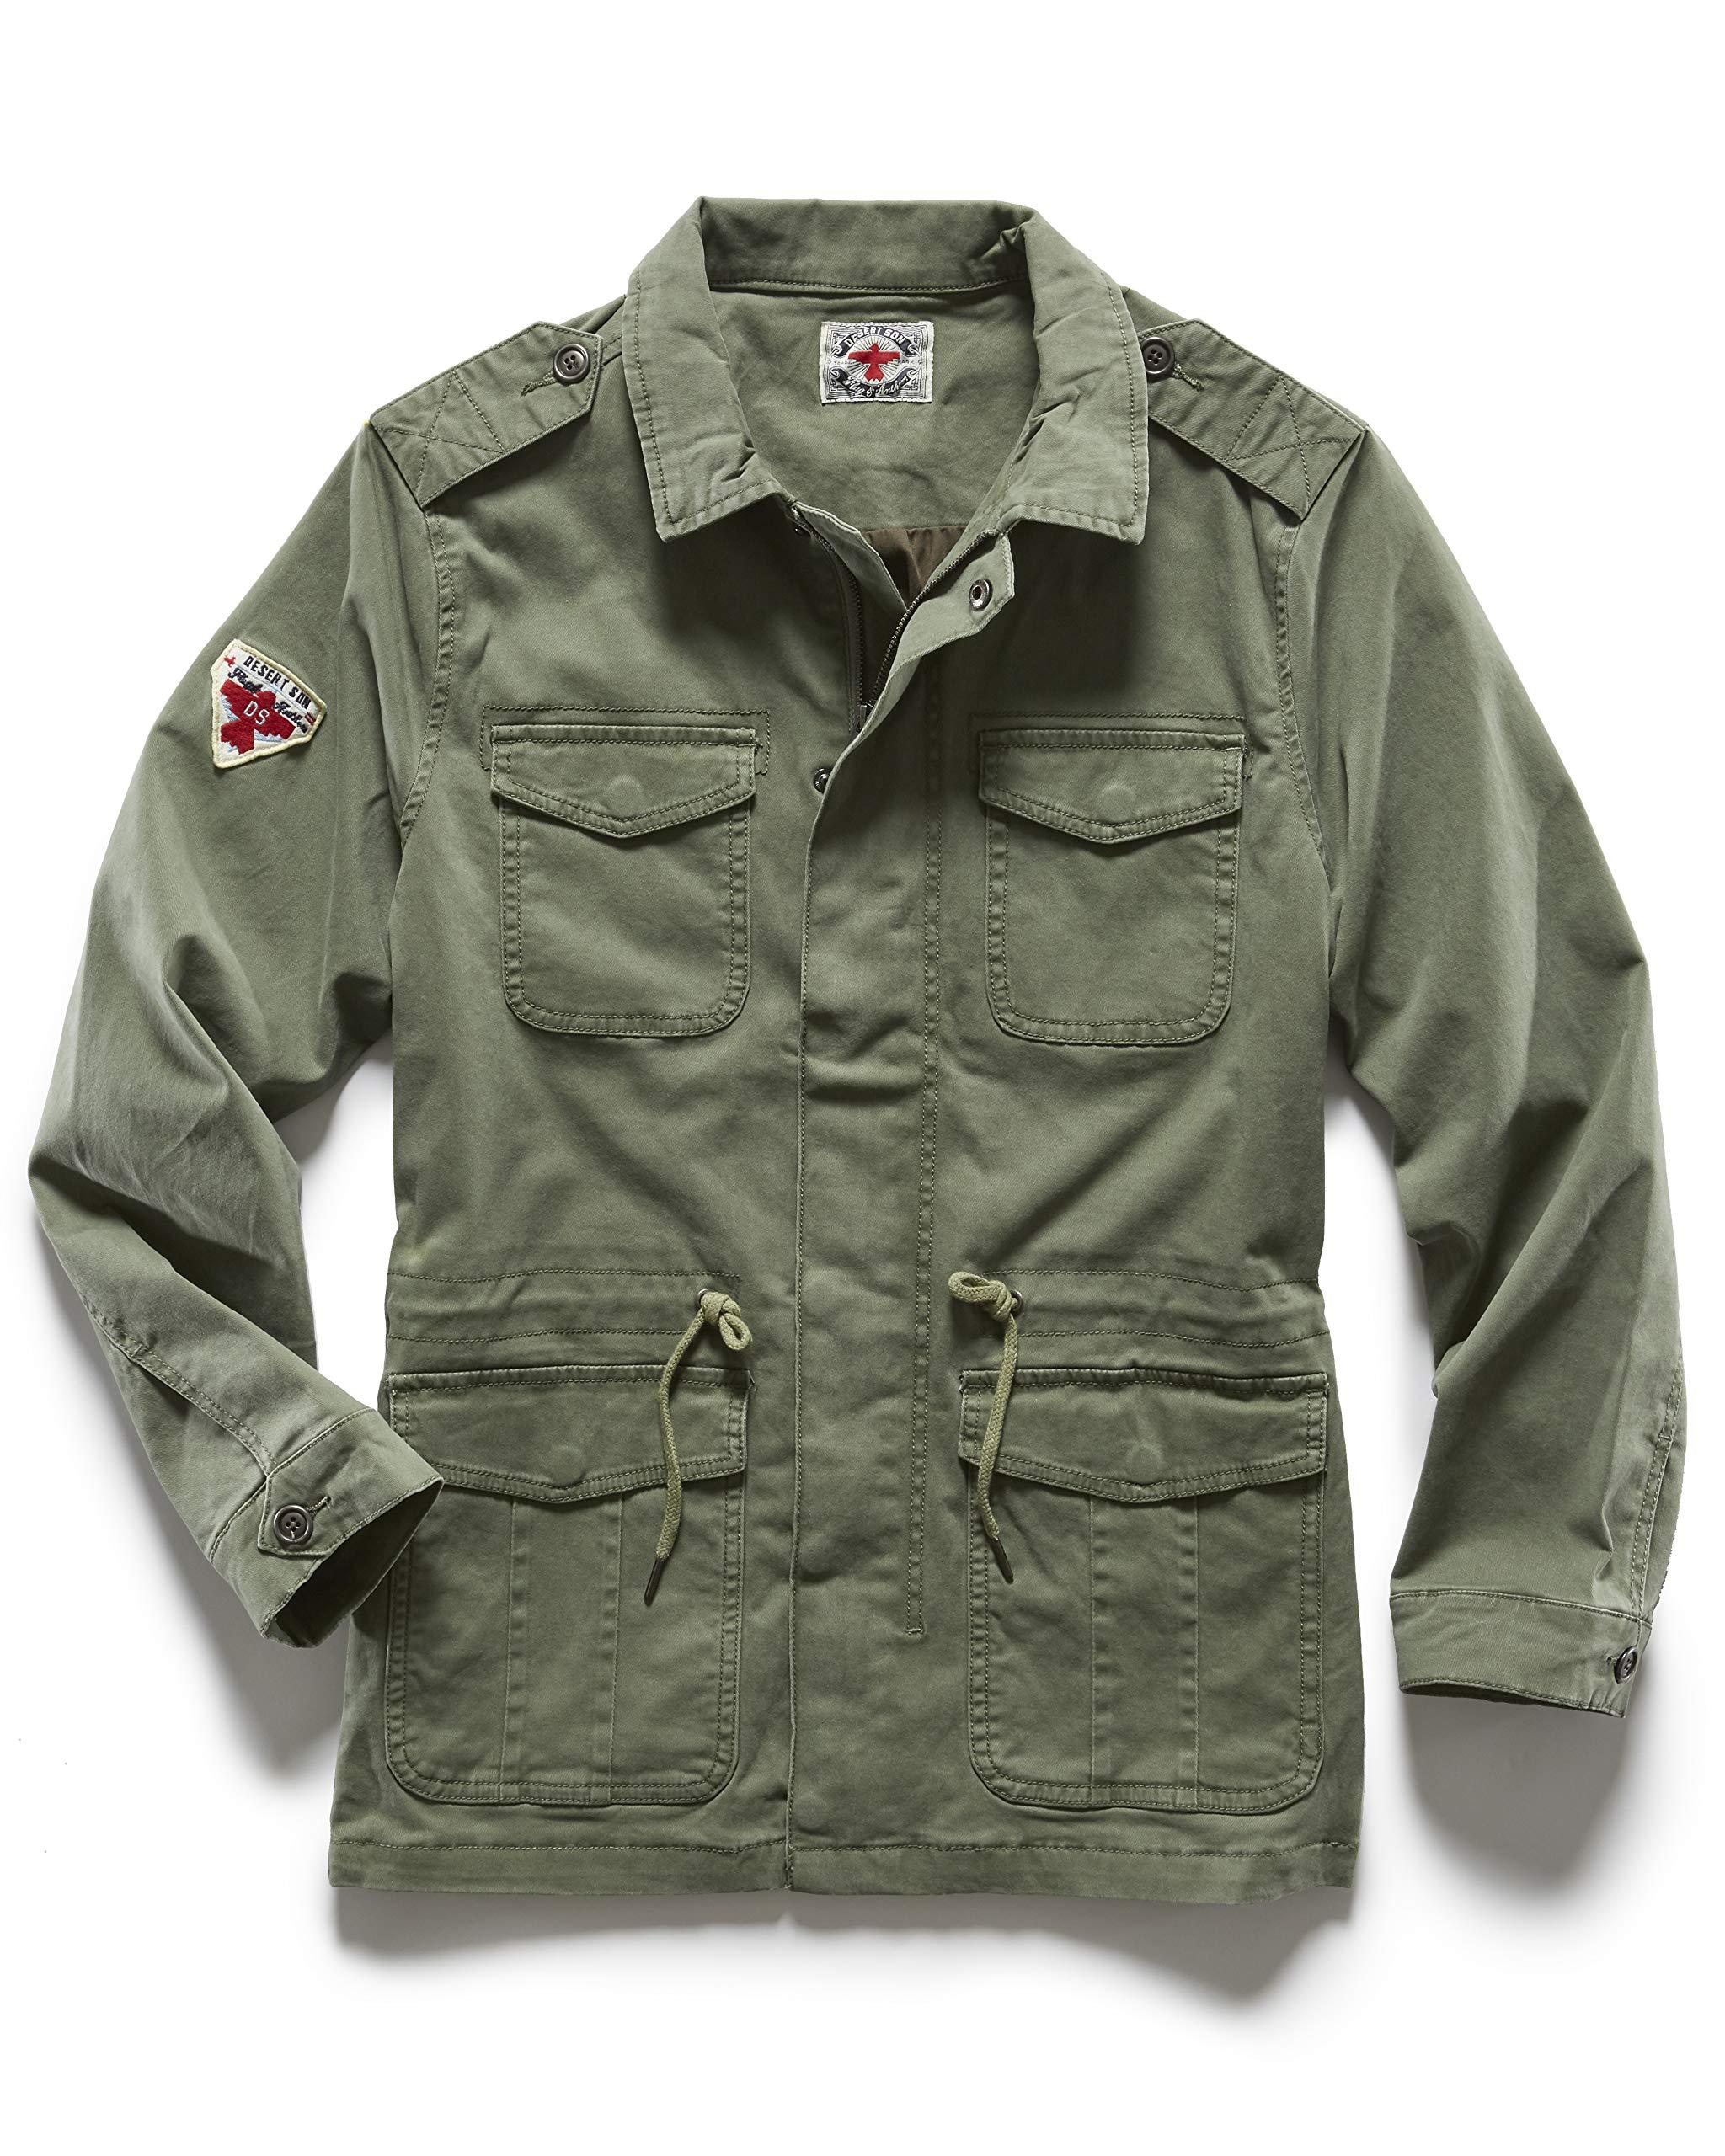 c90548348 Amazon.com: Flag & Anthem: Jackets & Vests